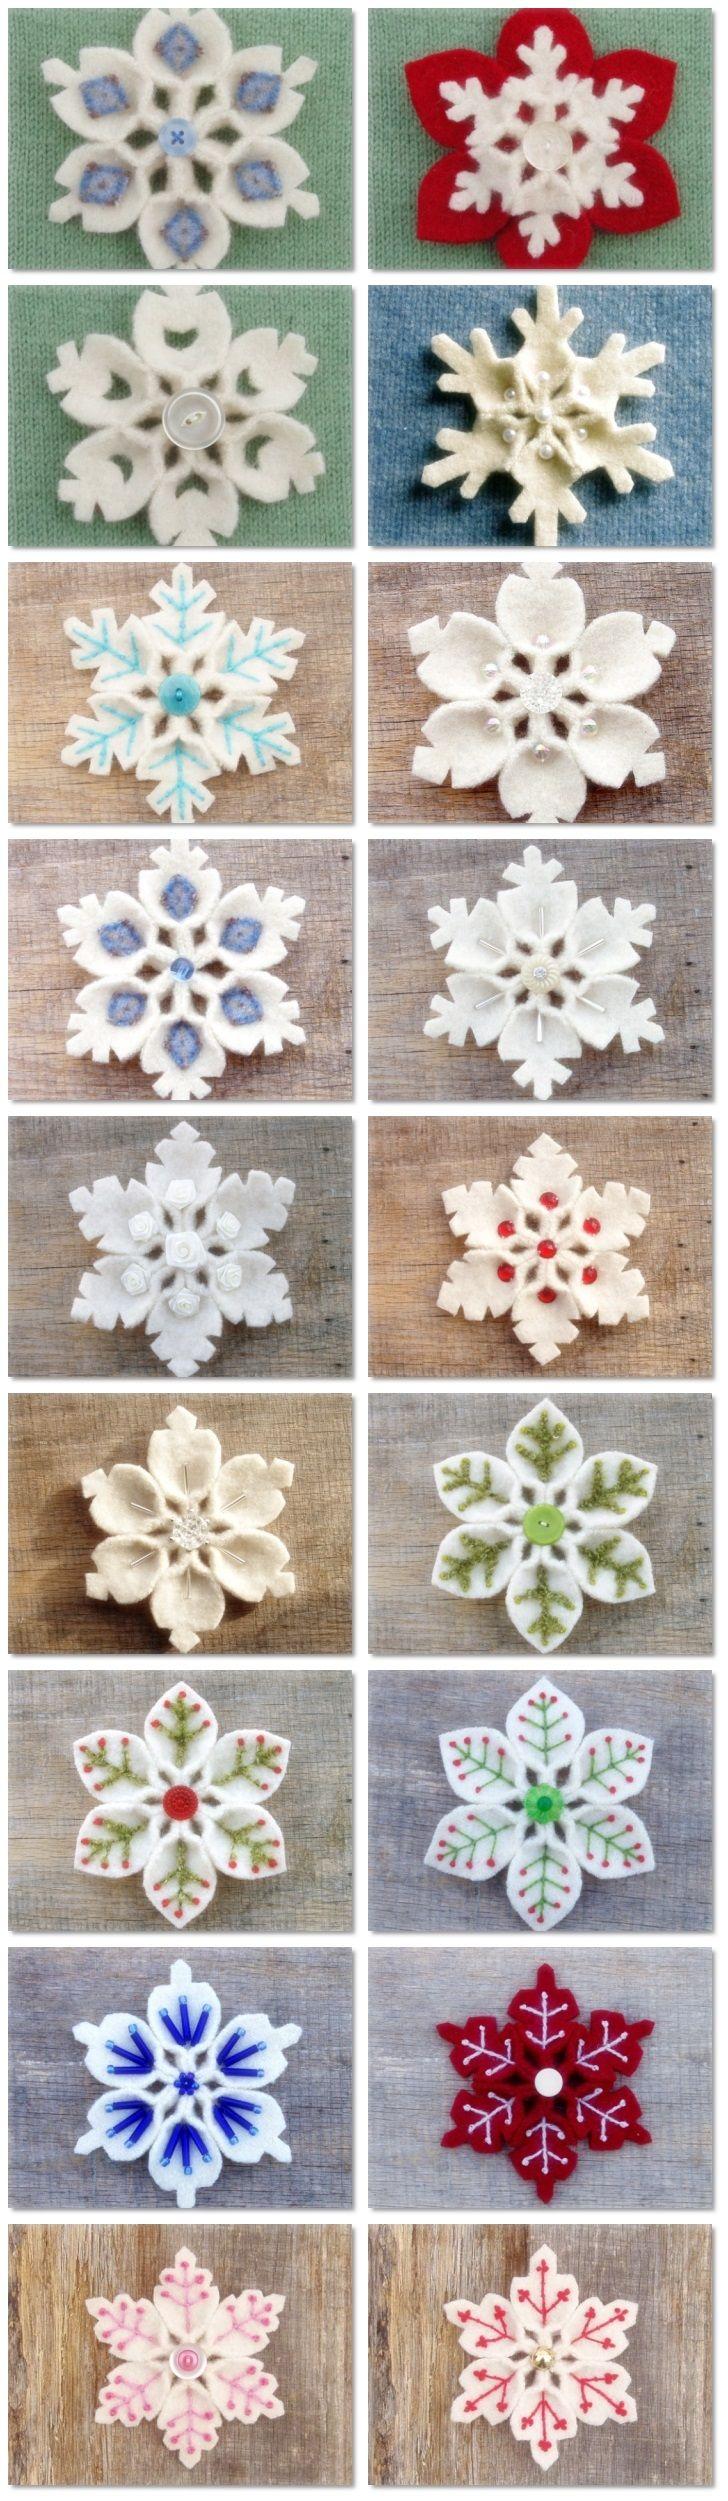 How to make Felt Snowflake DIY step by step tutorial